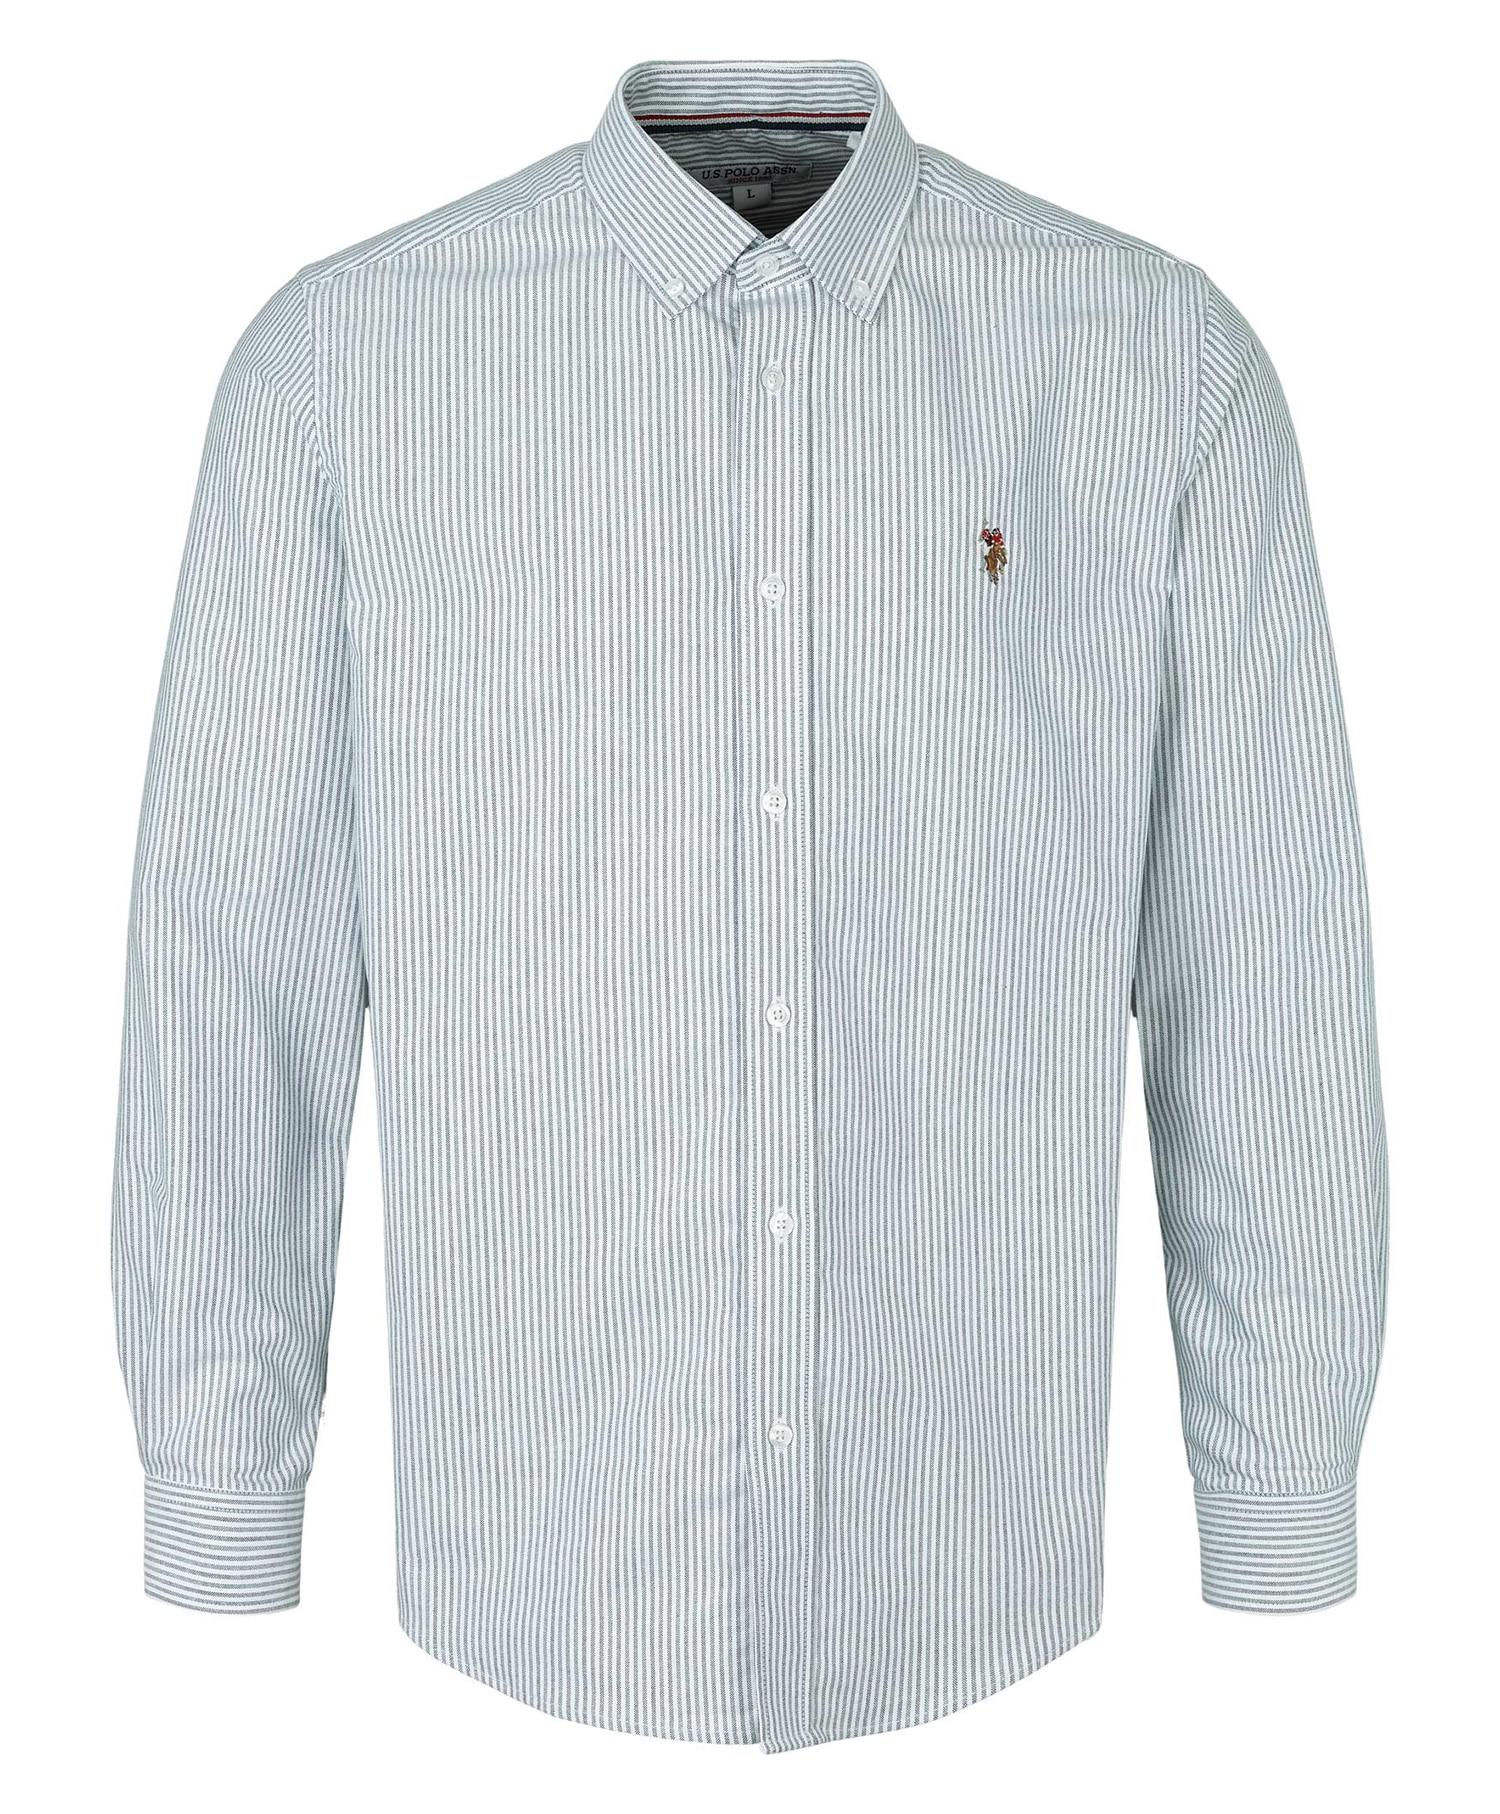 U.S Polo Armin Shirt